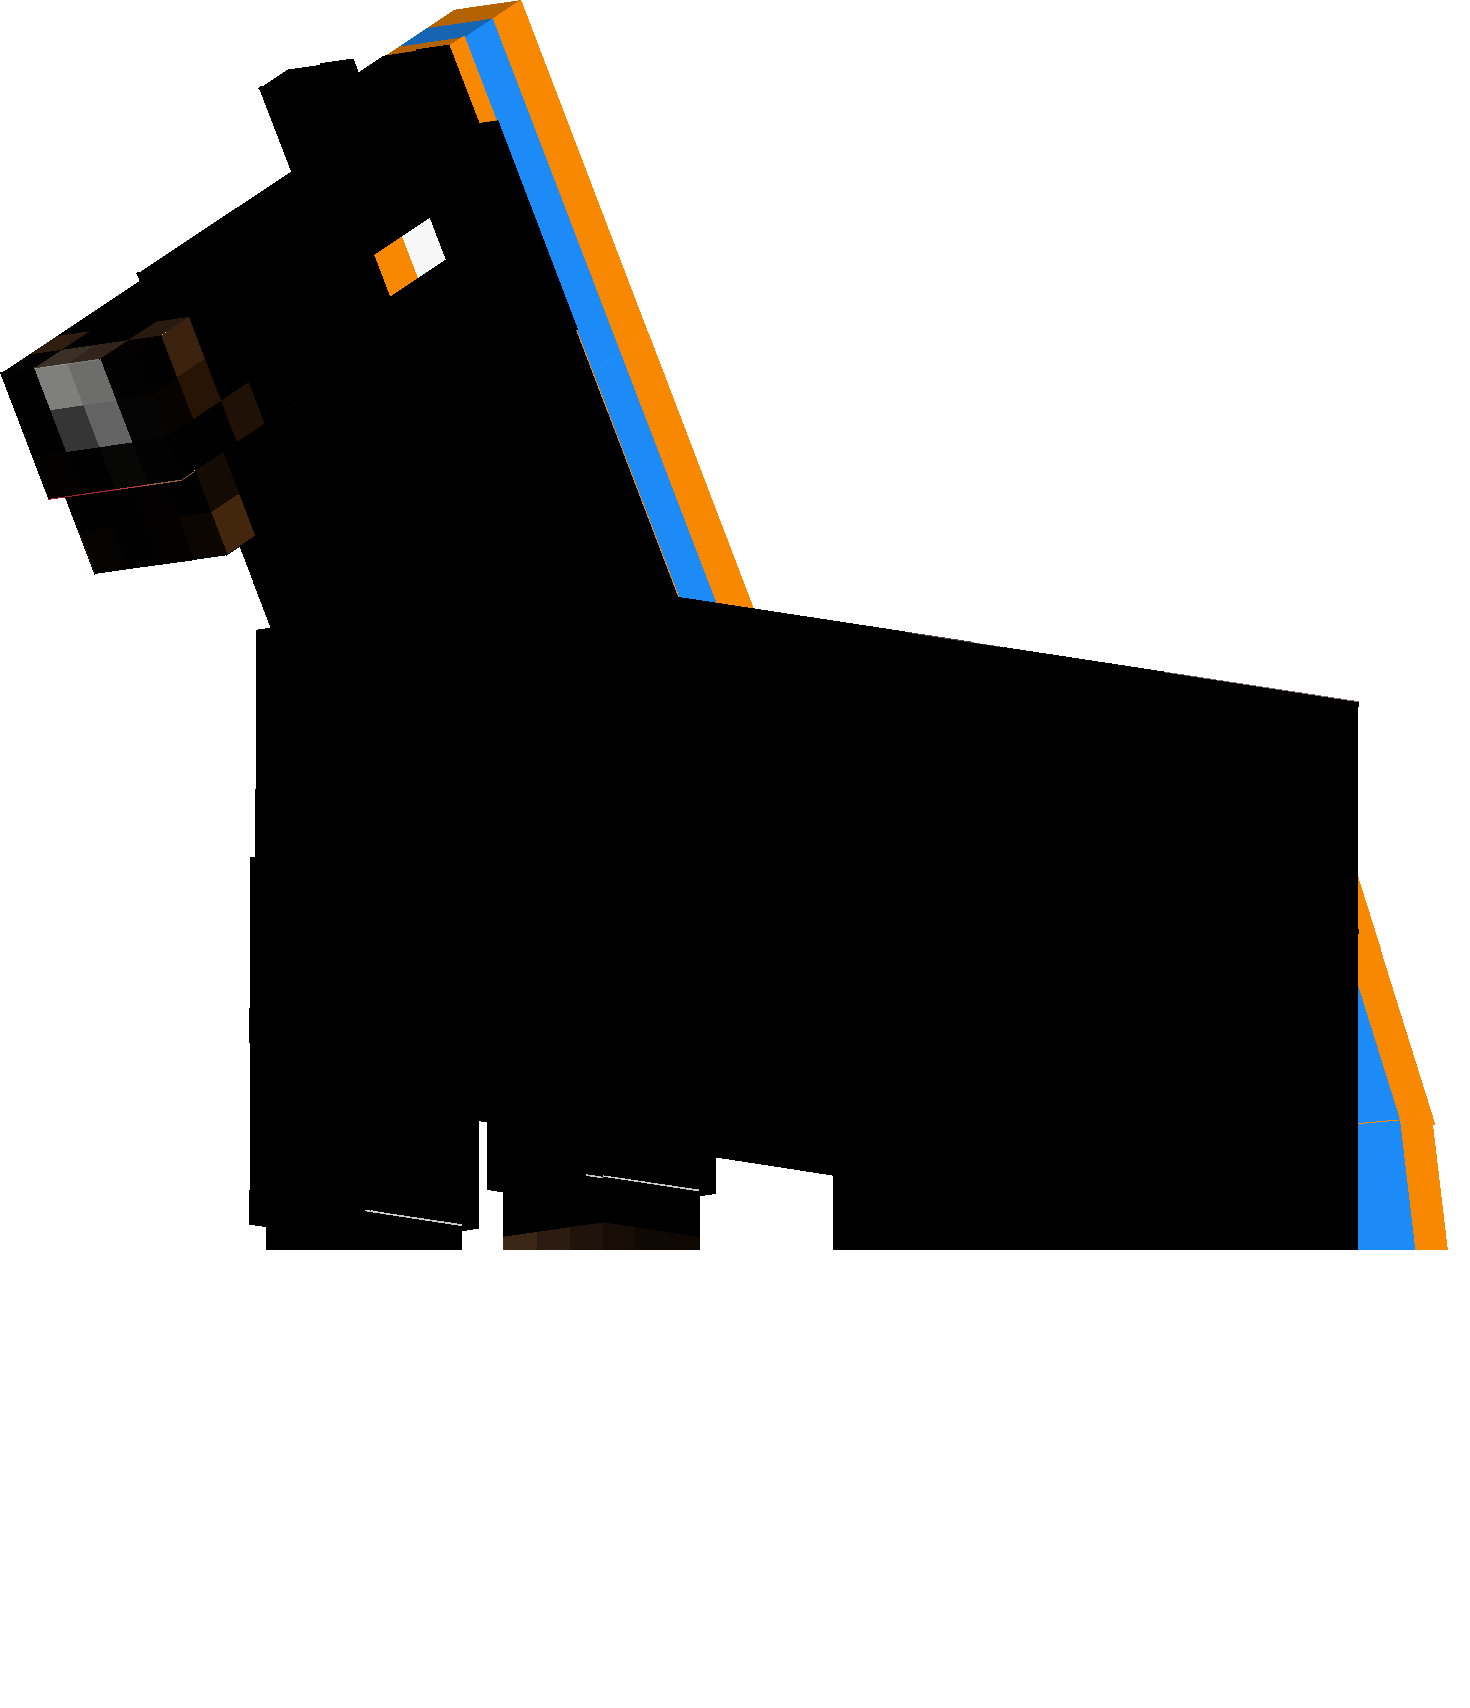 Pitch Bend 1470x1708